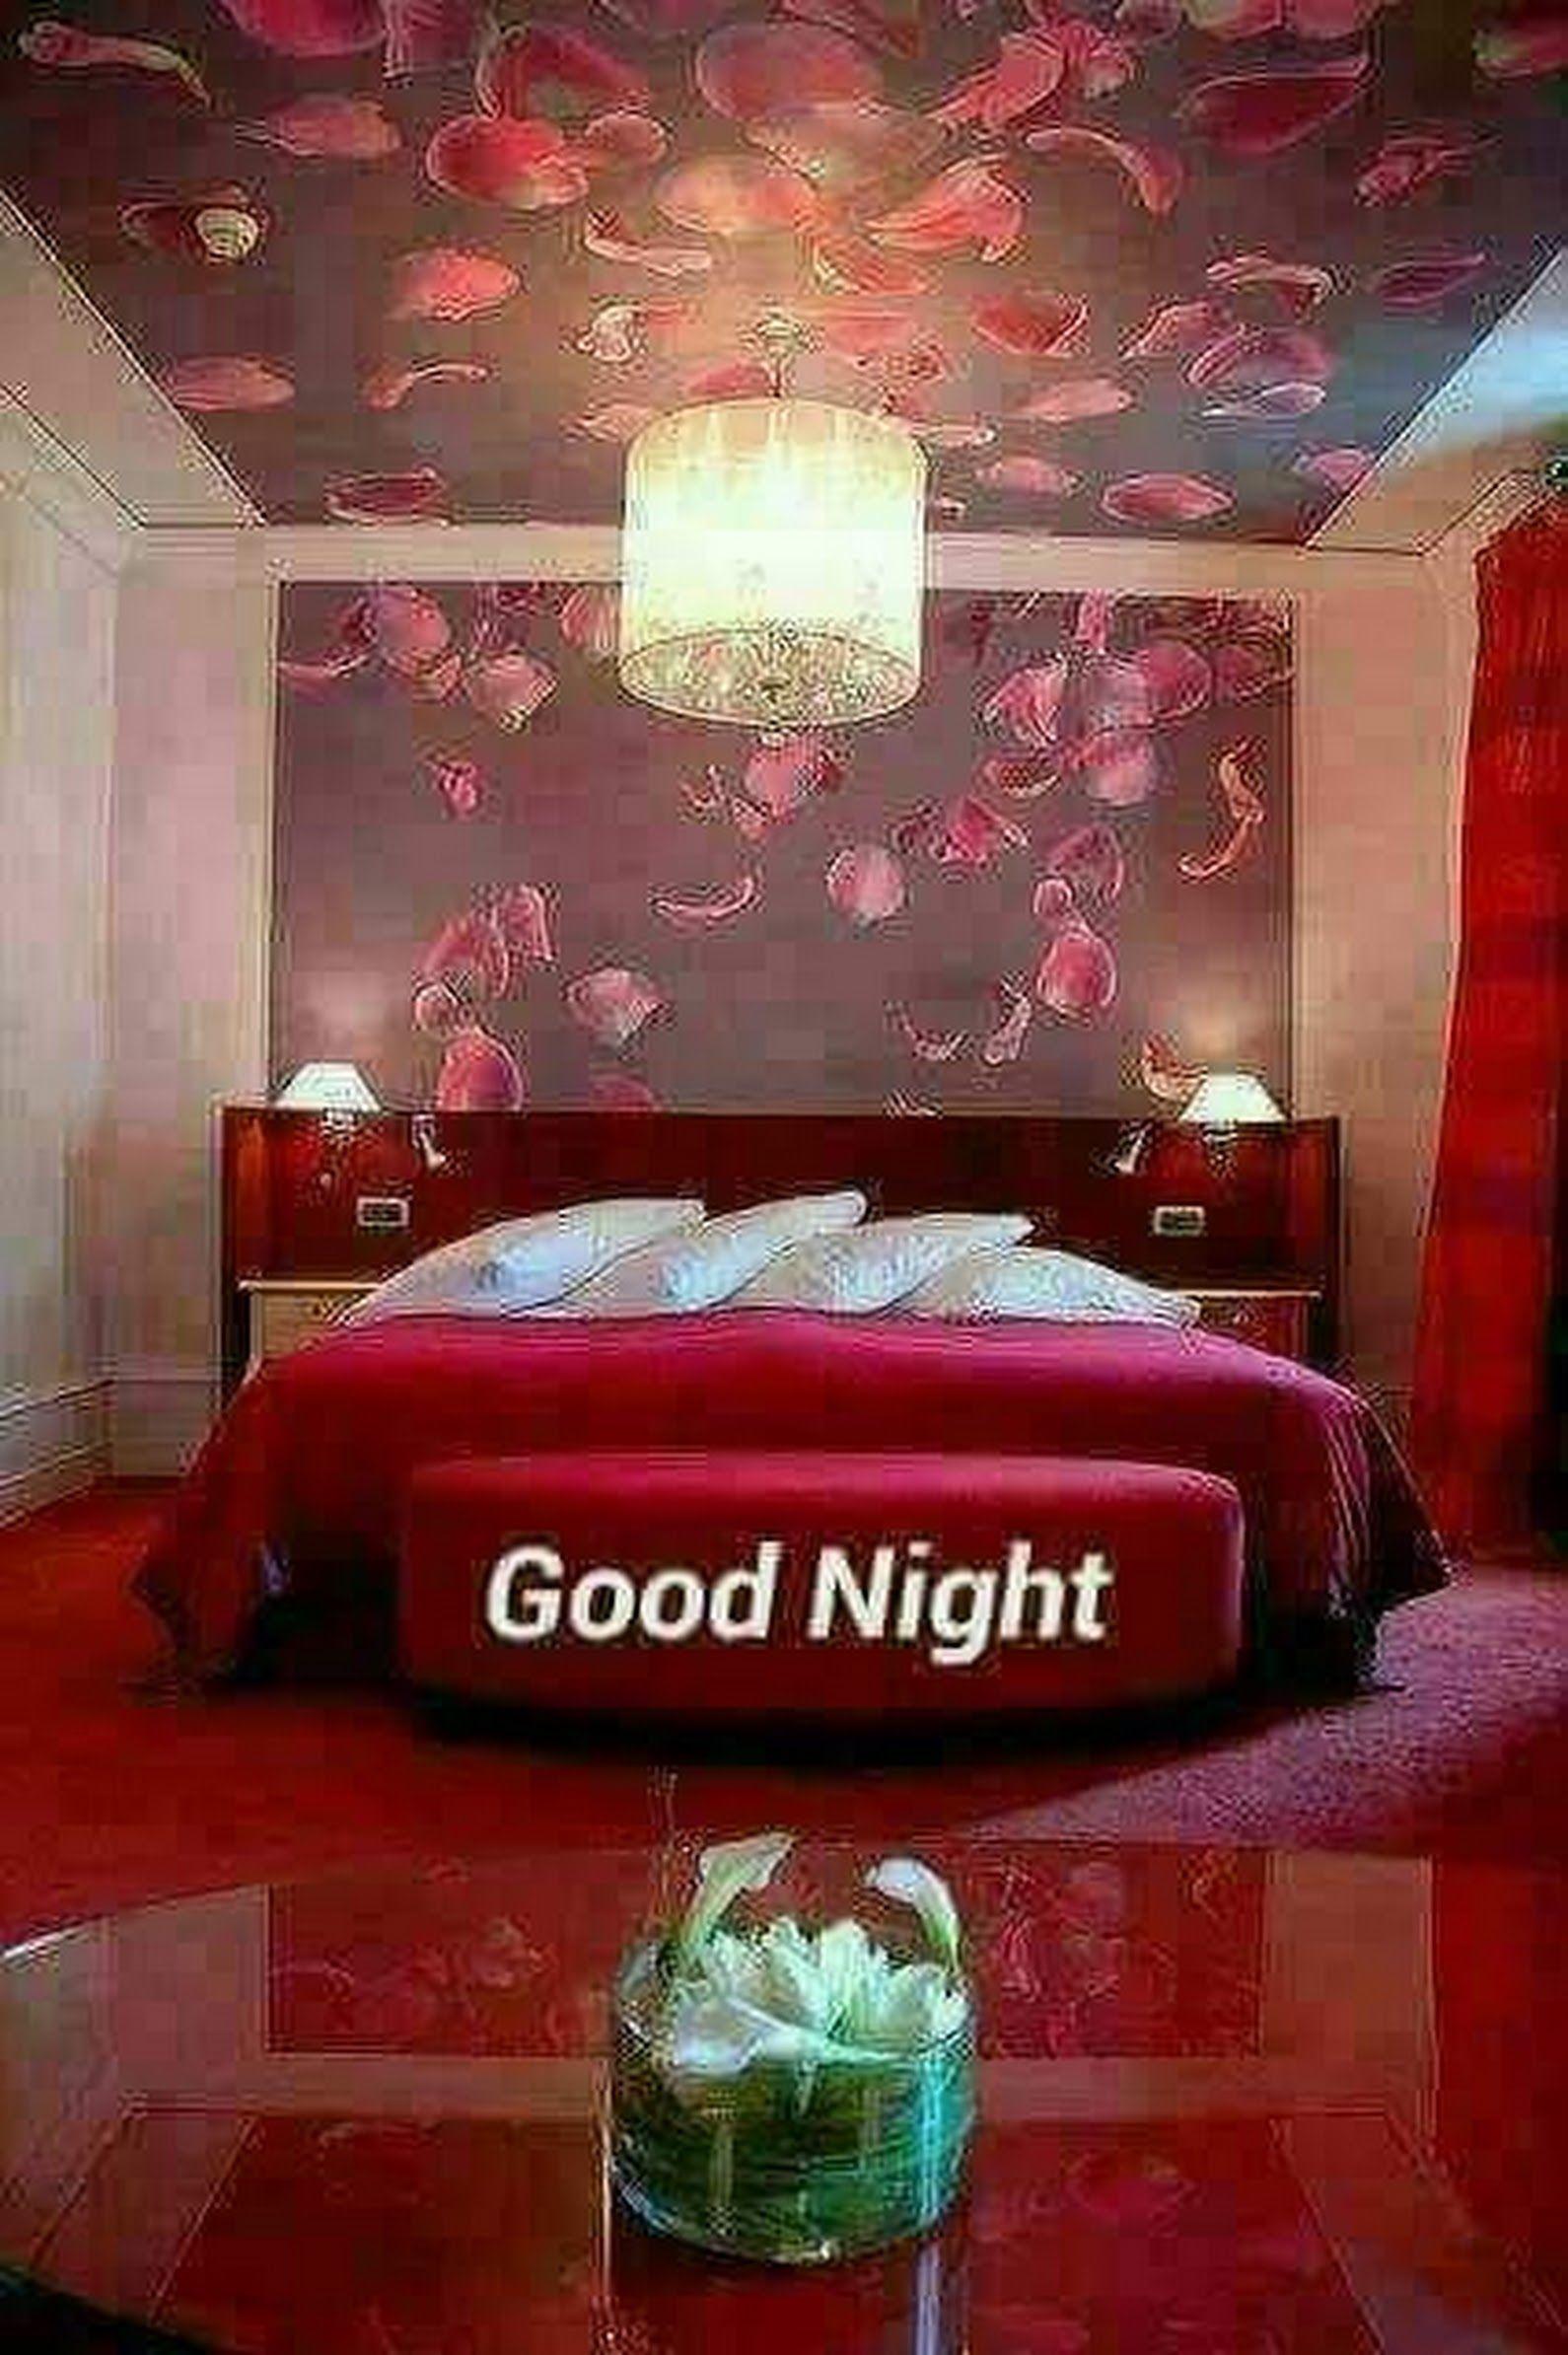 Manohar Upadhyay Good Night Image Good Night Good Night Sweet